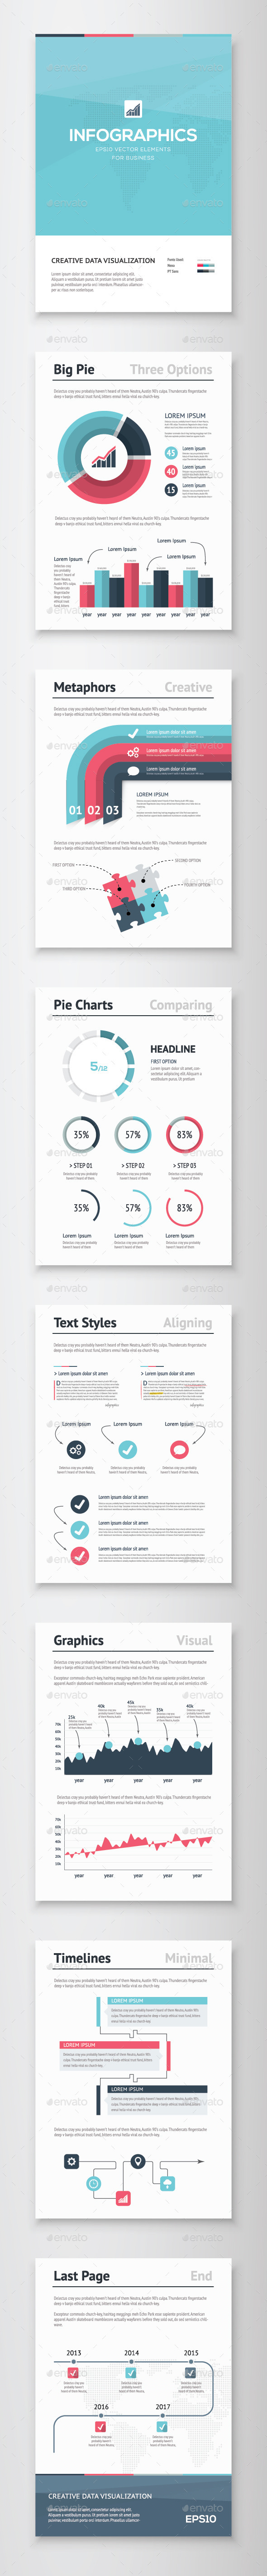 Infographic Brochure Vector Elements Kit 5 - Infographics